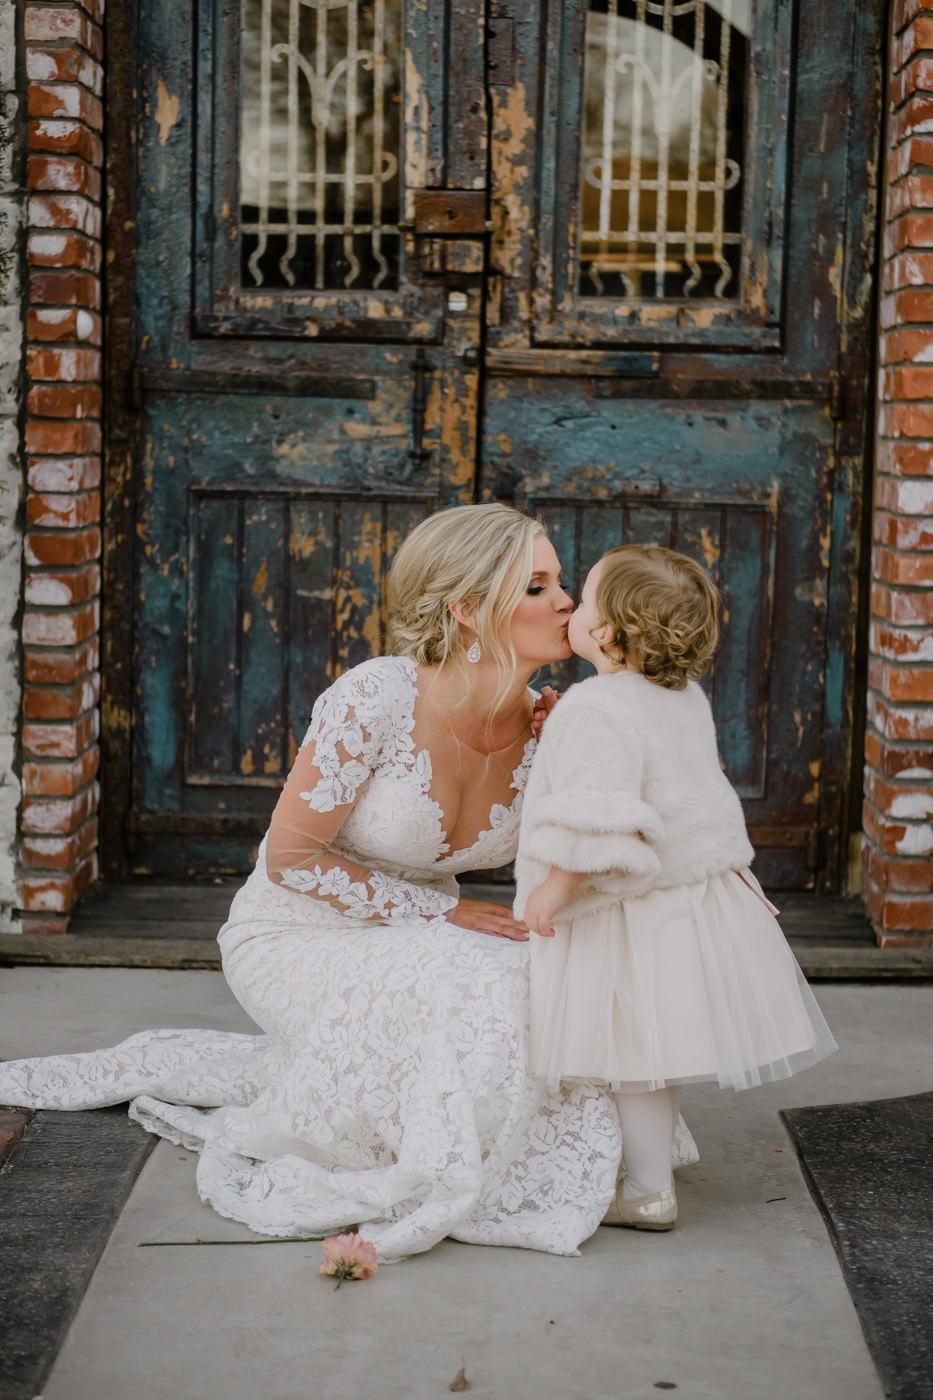 ravington.wedding.northwestarkansas.mileswittboyer-30.jpg